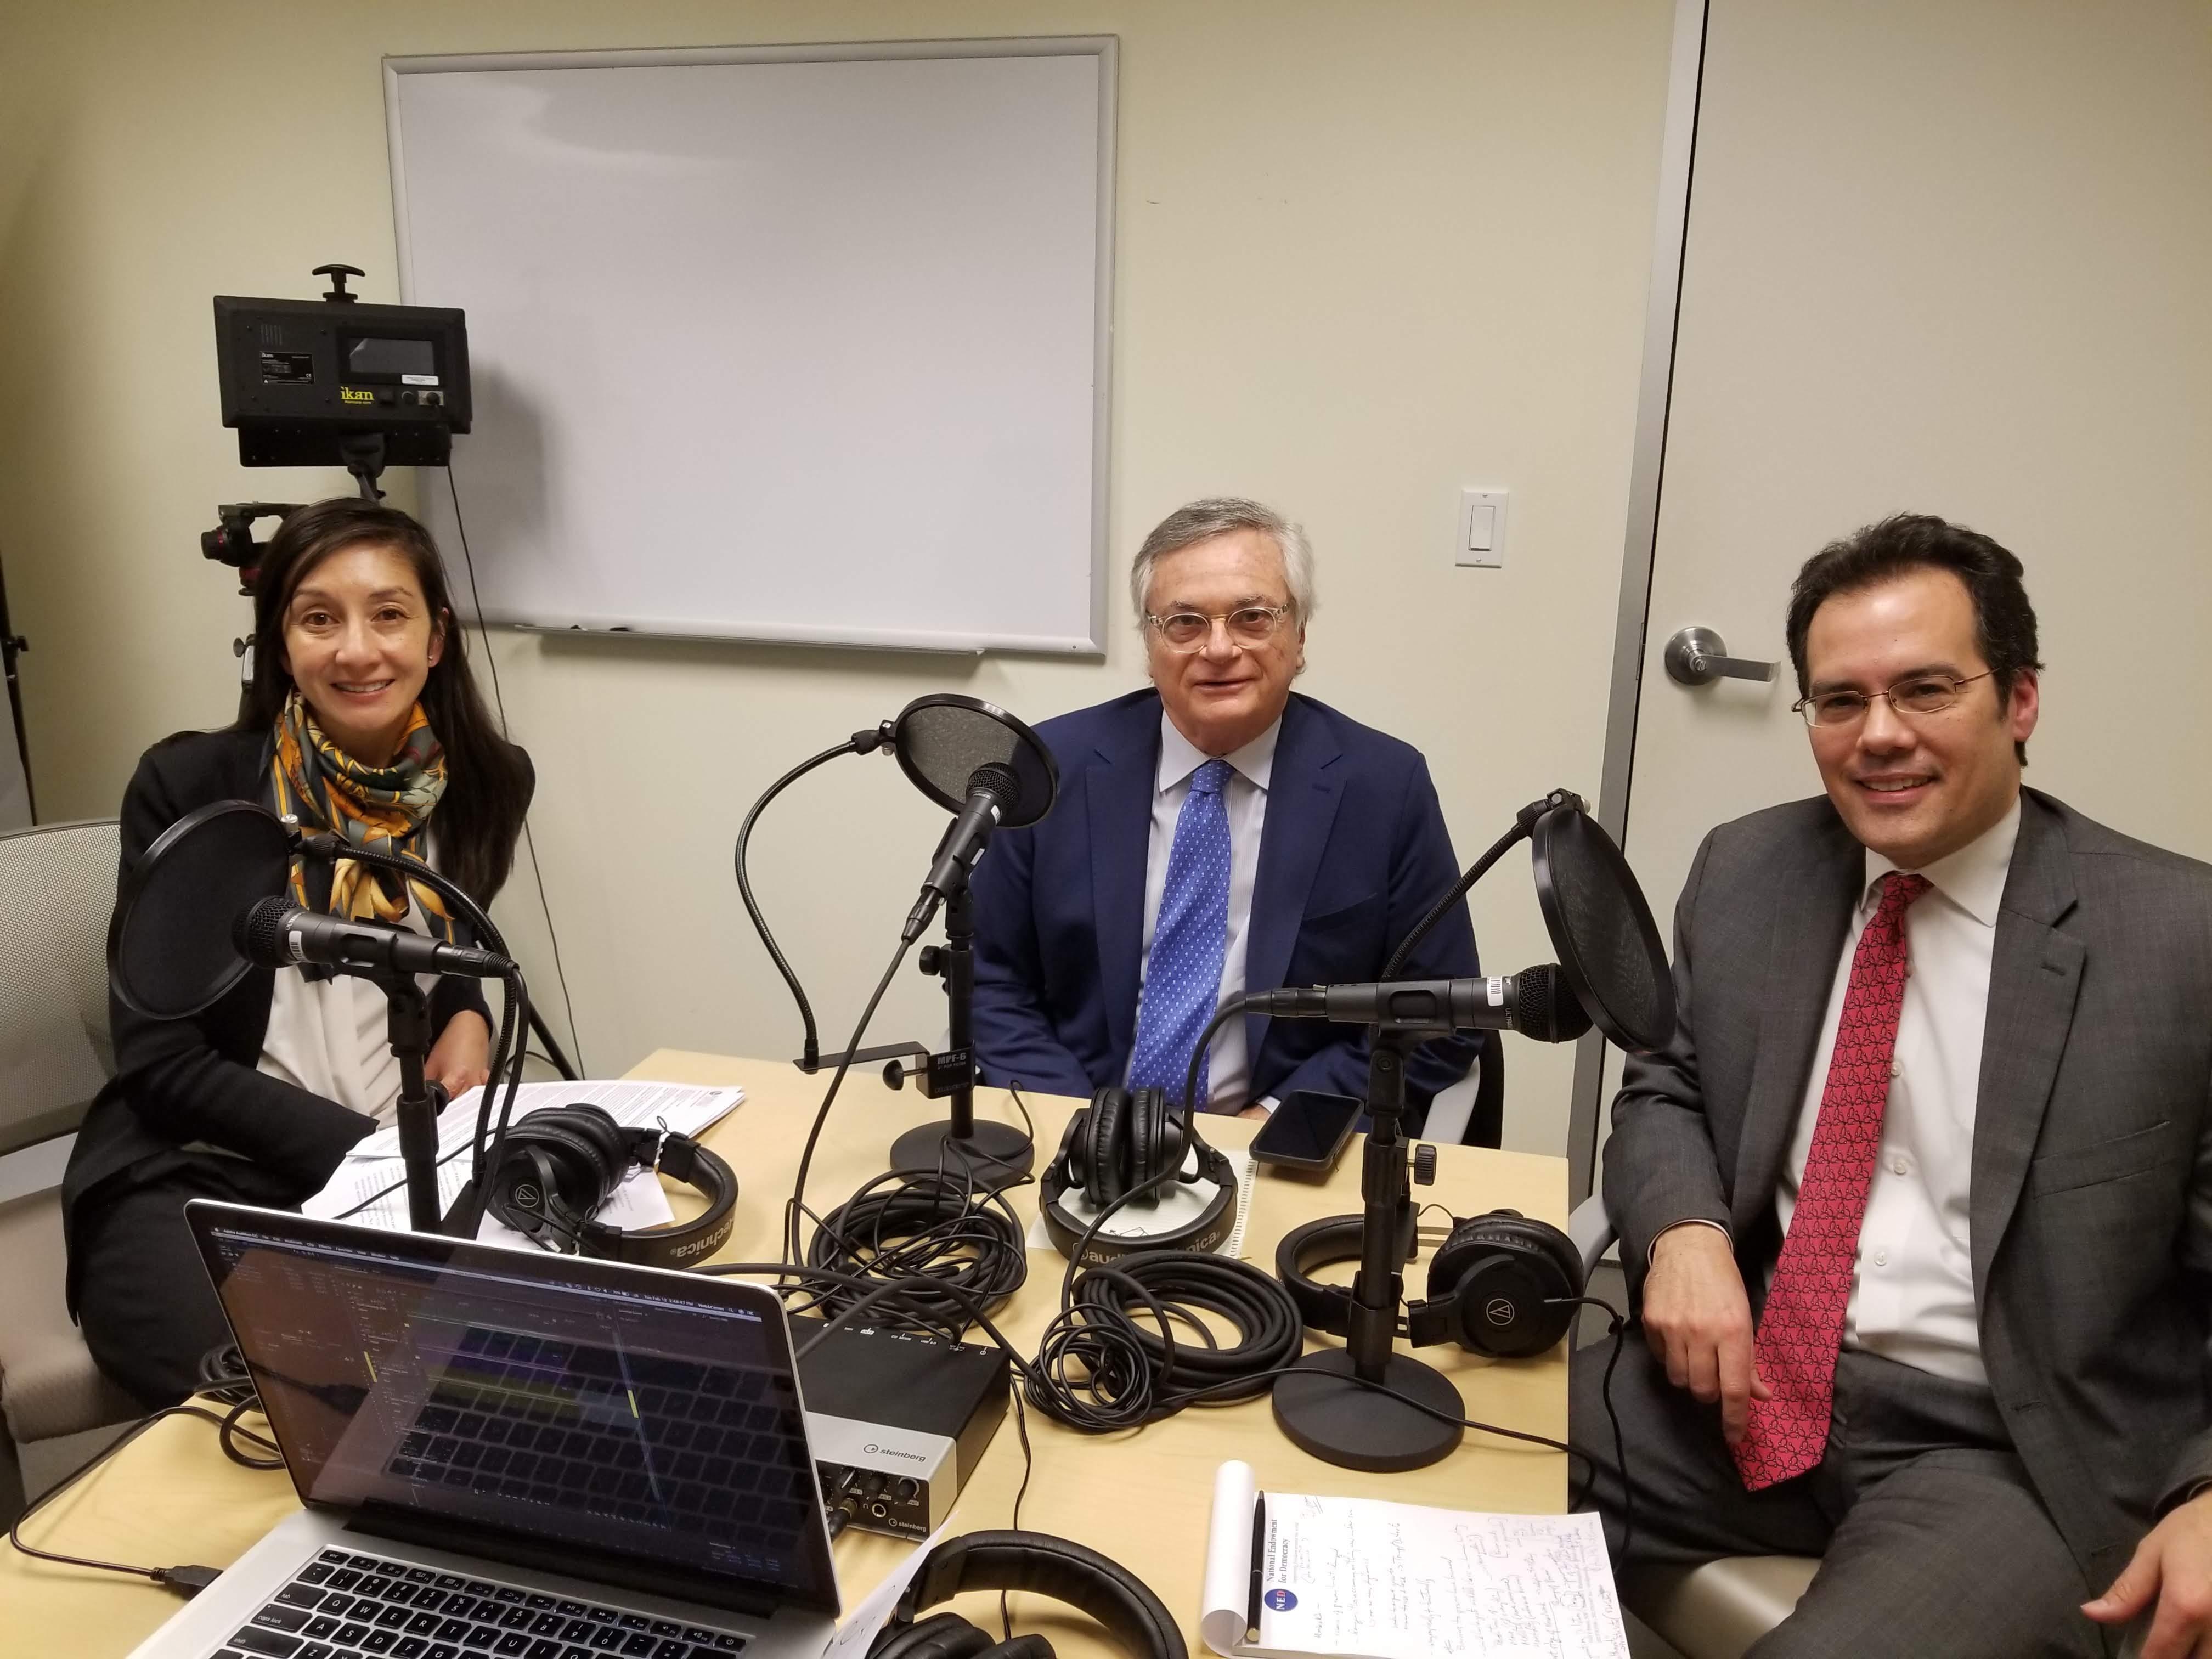 Power 3 0 Podcast | Authoritarian Resurgence, Democratic Resilience